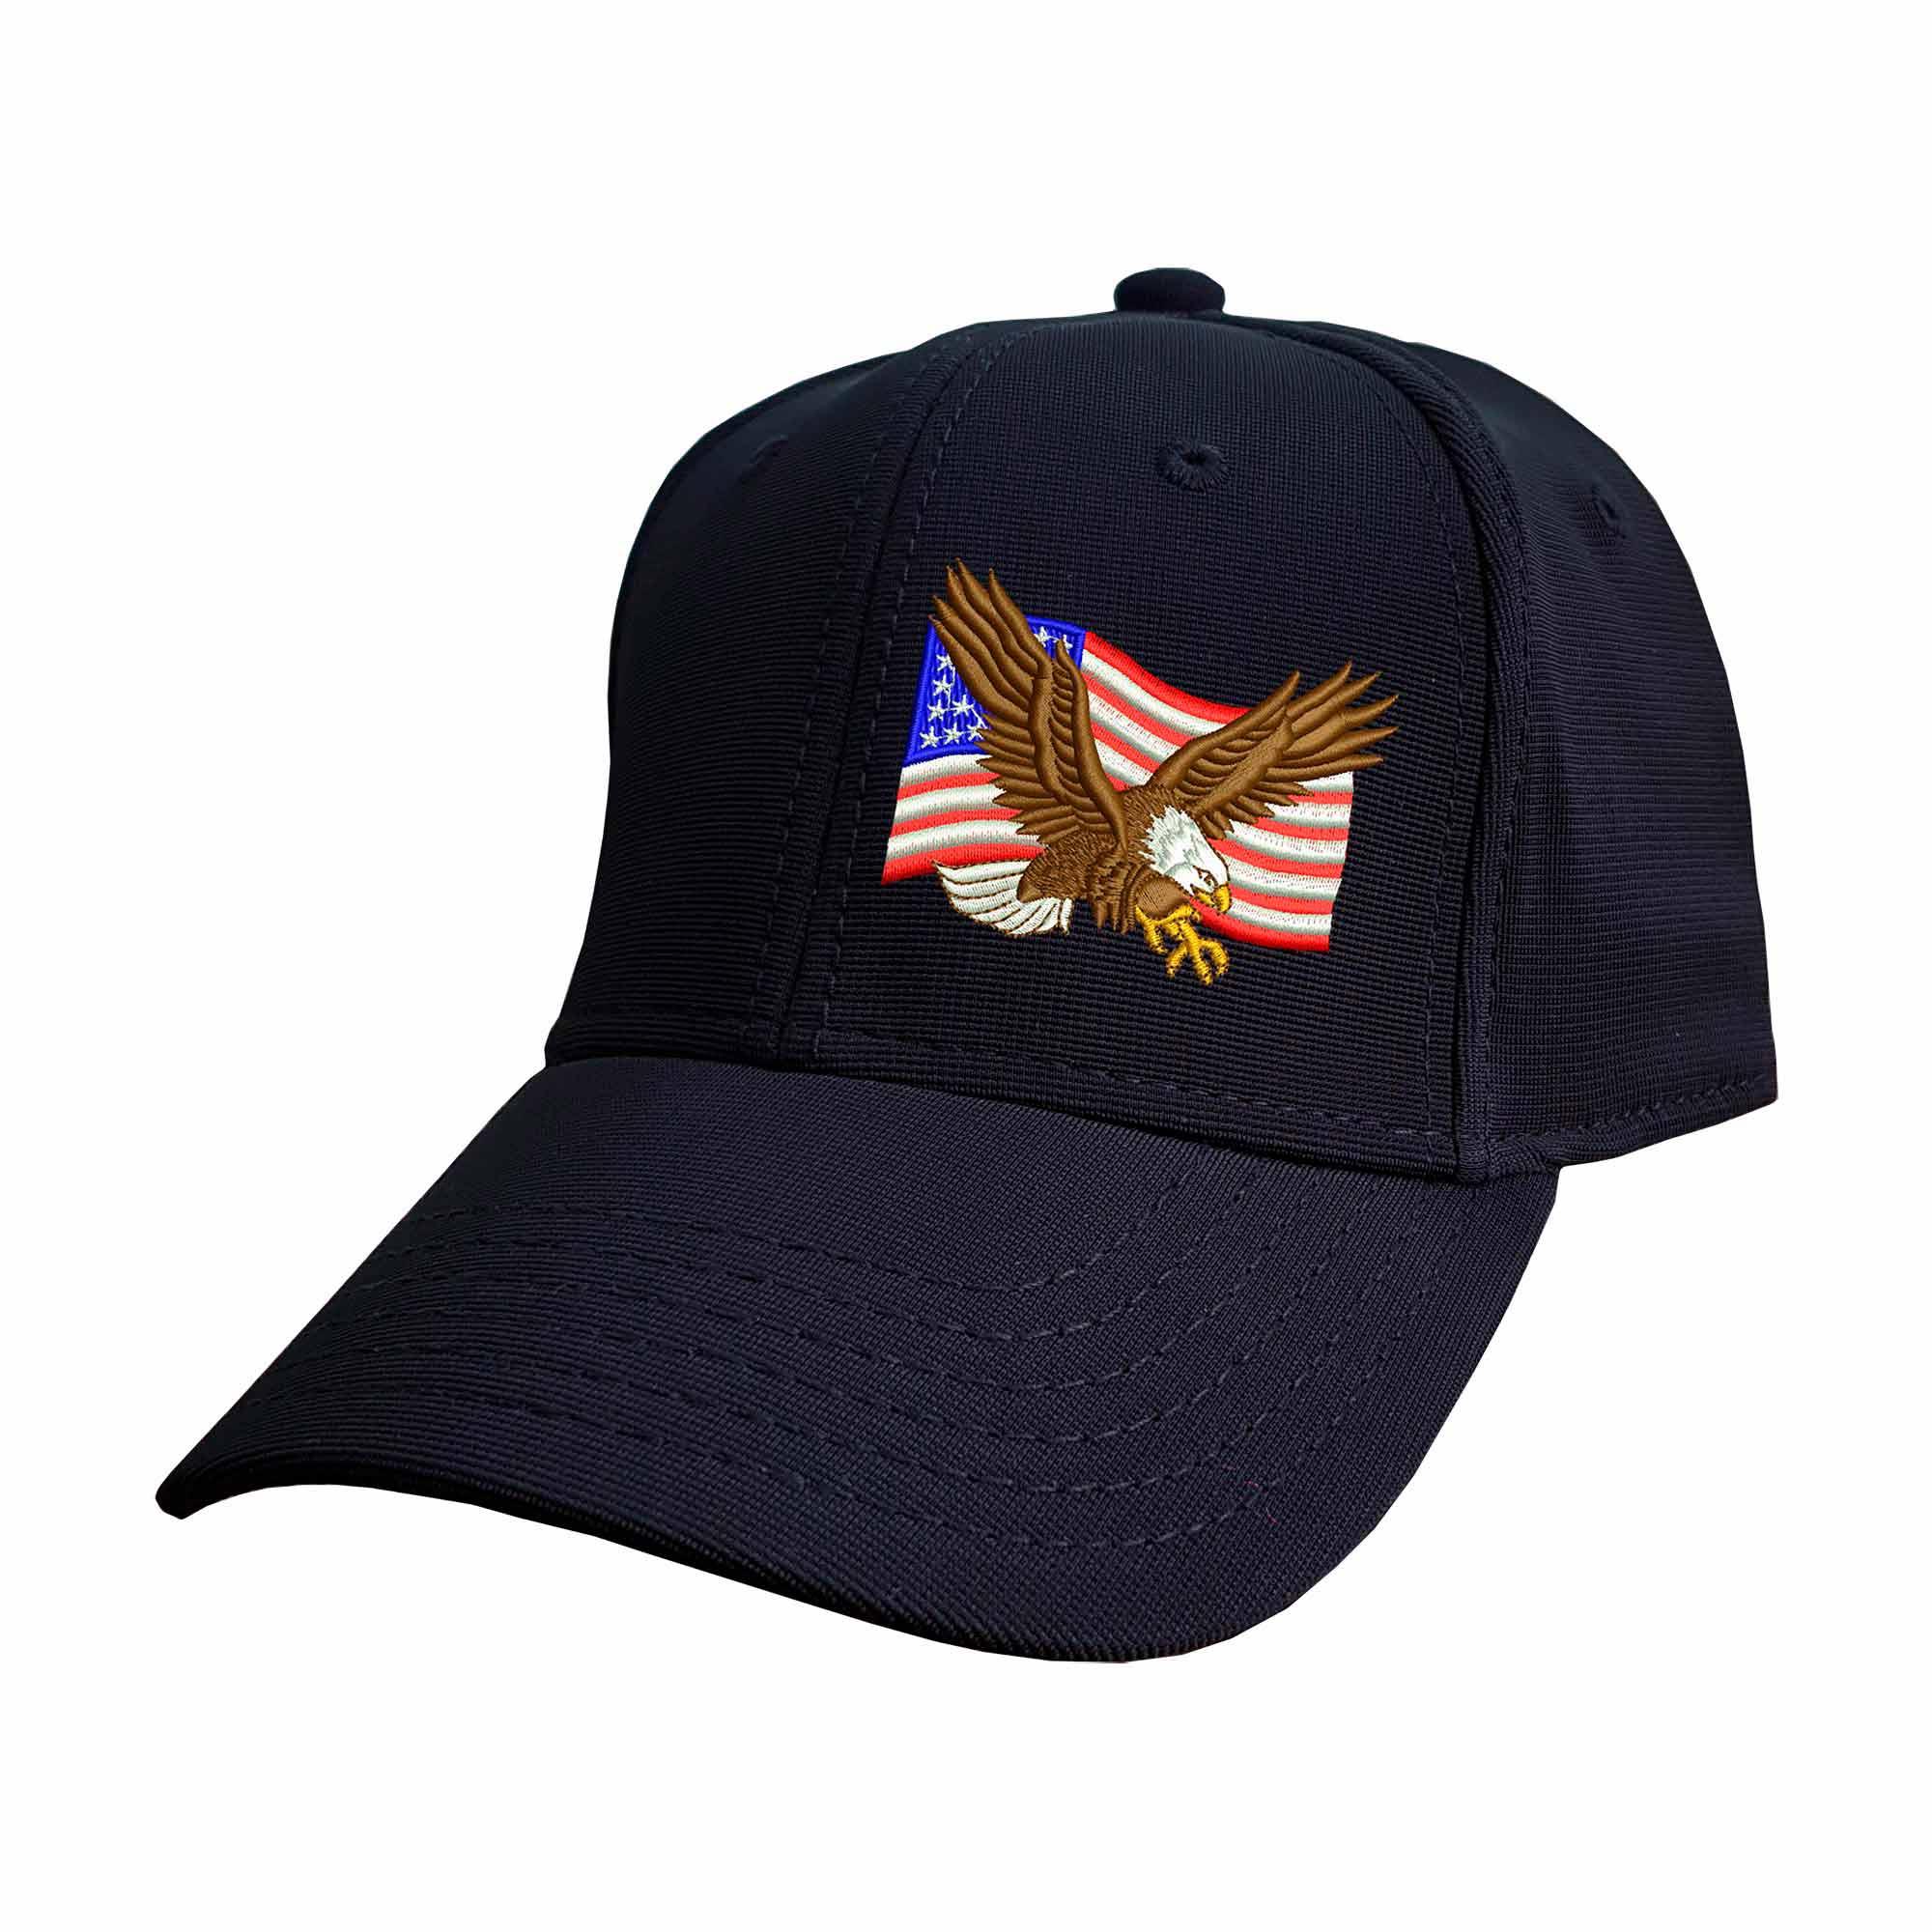 Boné Bordado Fechado Bandeira Eua Aguia Americana USA  - Talysmã Bordados